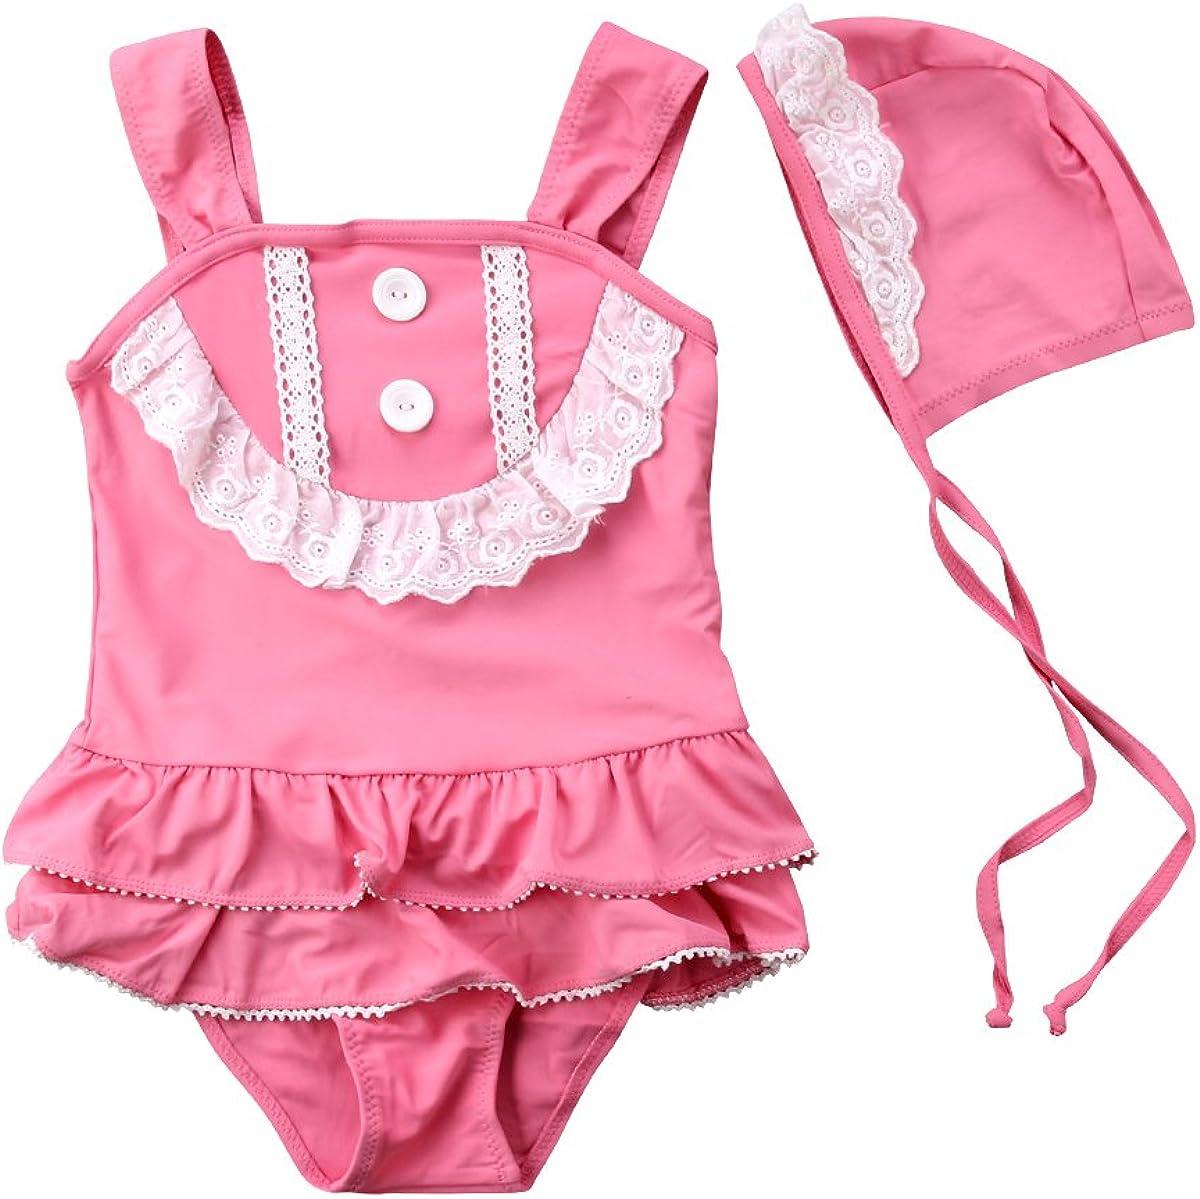 Kids Girl One-Piece Swimsuit Ruffles Lace Trim Sleeveless Swimwe